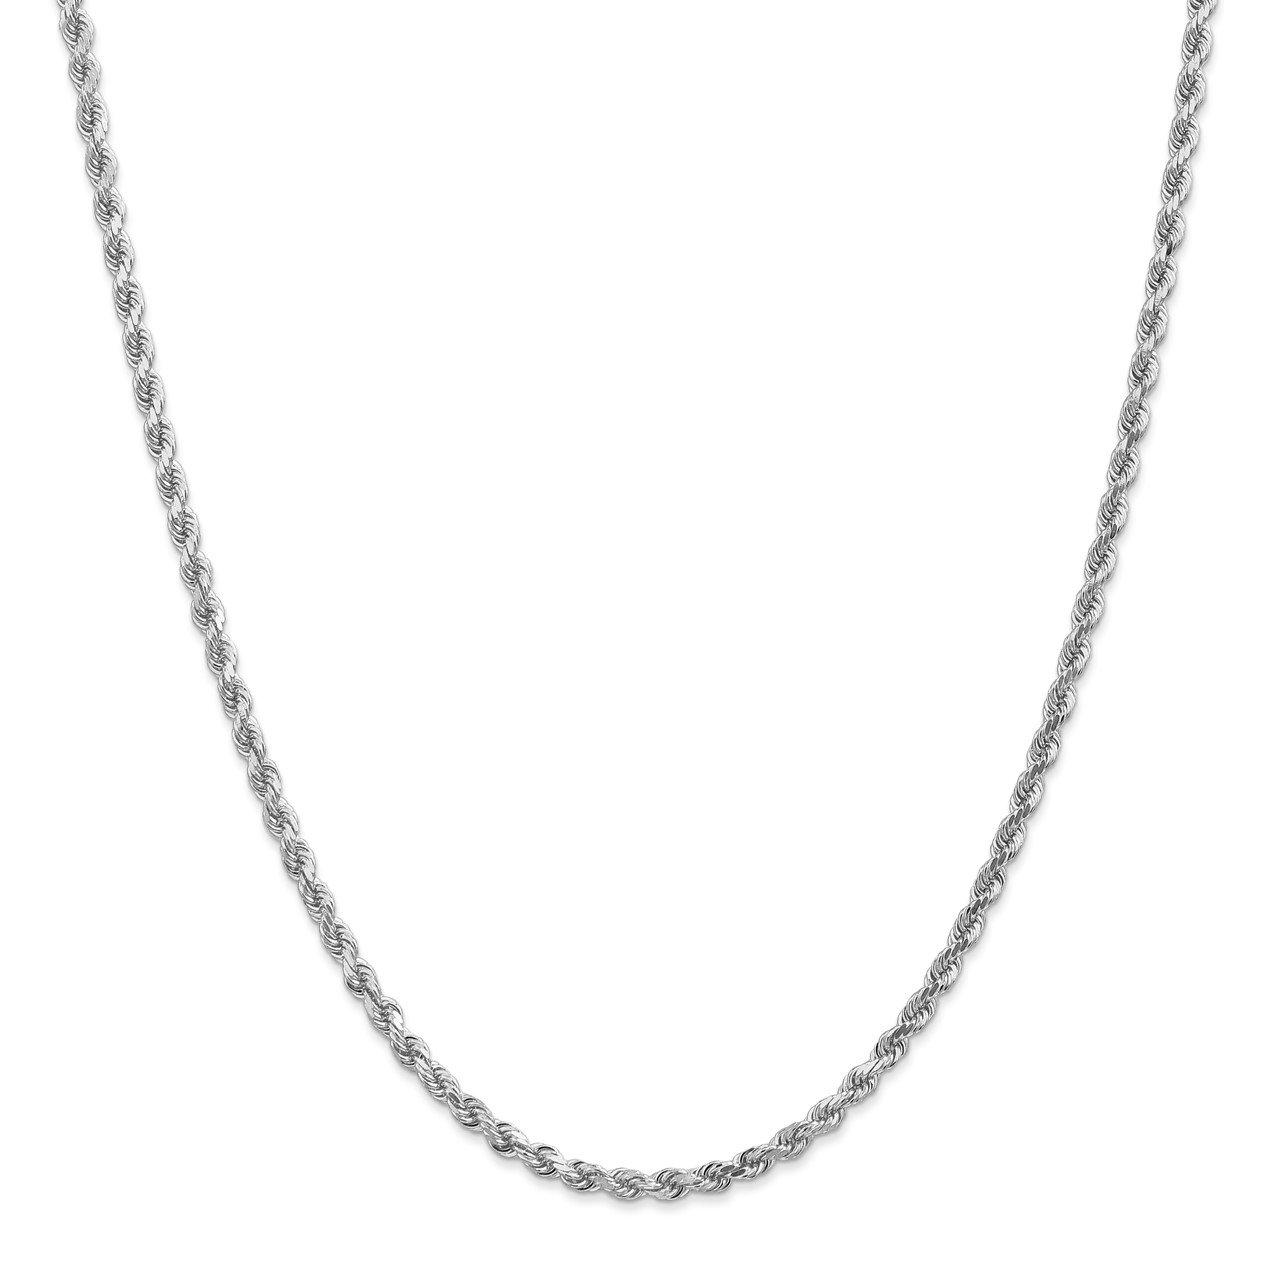 Leslie's 14K White Gold 3mm Diamond- cut Rope Chain